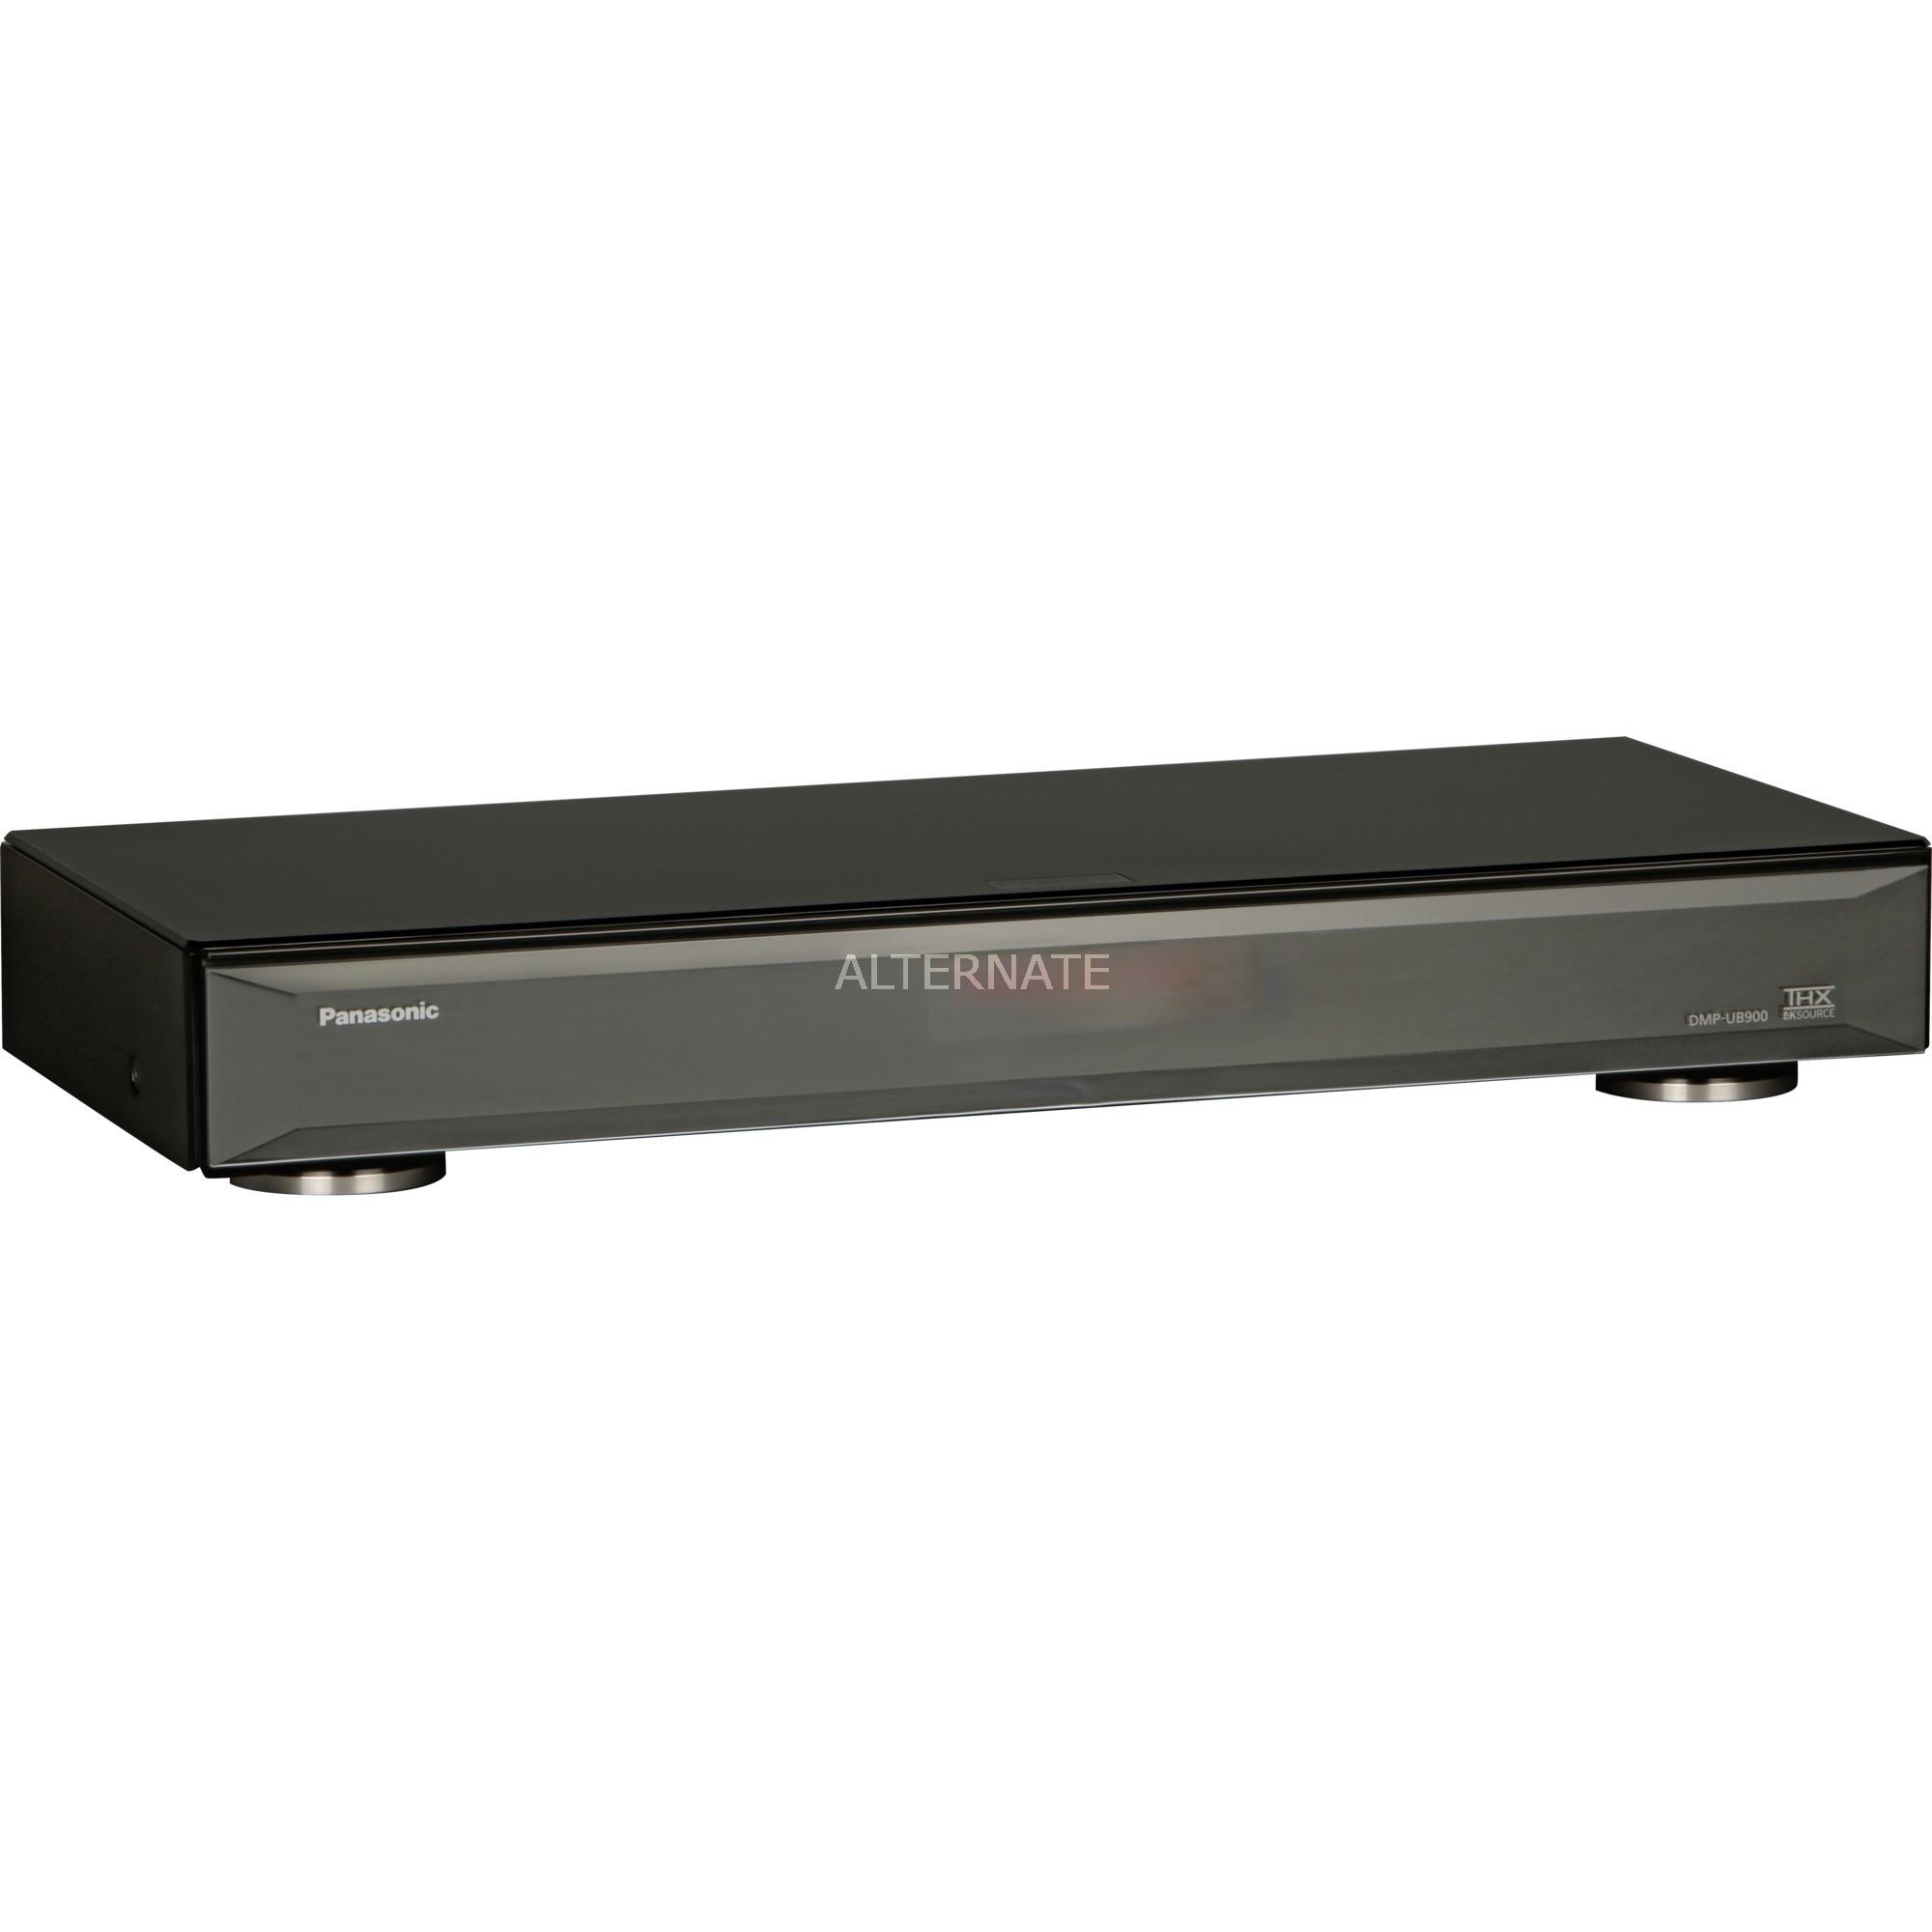 DMP-UB900EG Lecteur Blu-Ray 7.1 Noir lecteur Blu-Ray